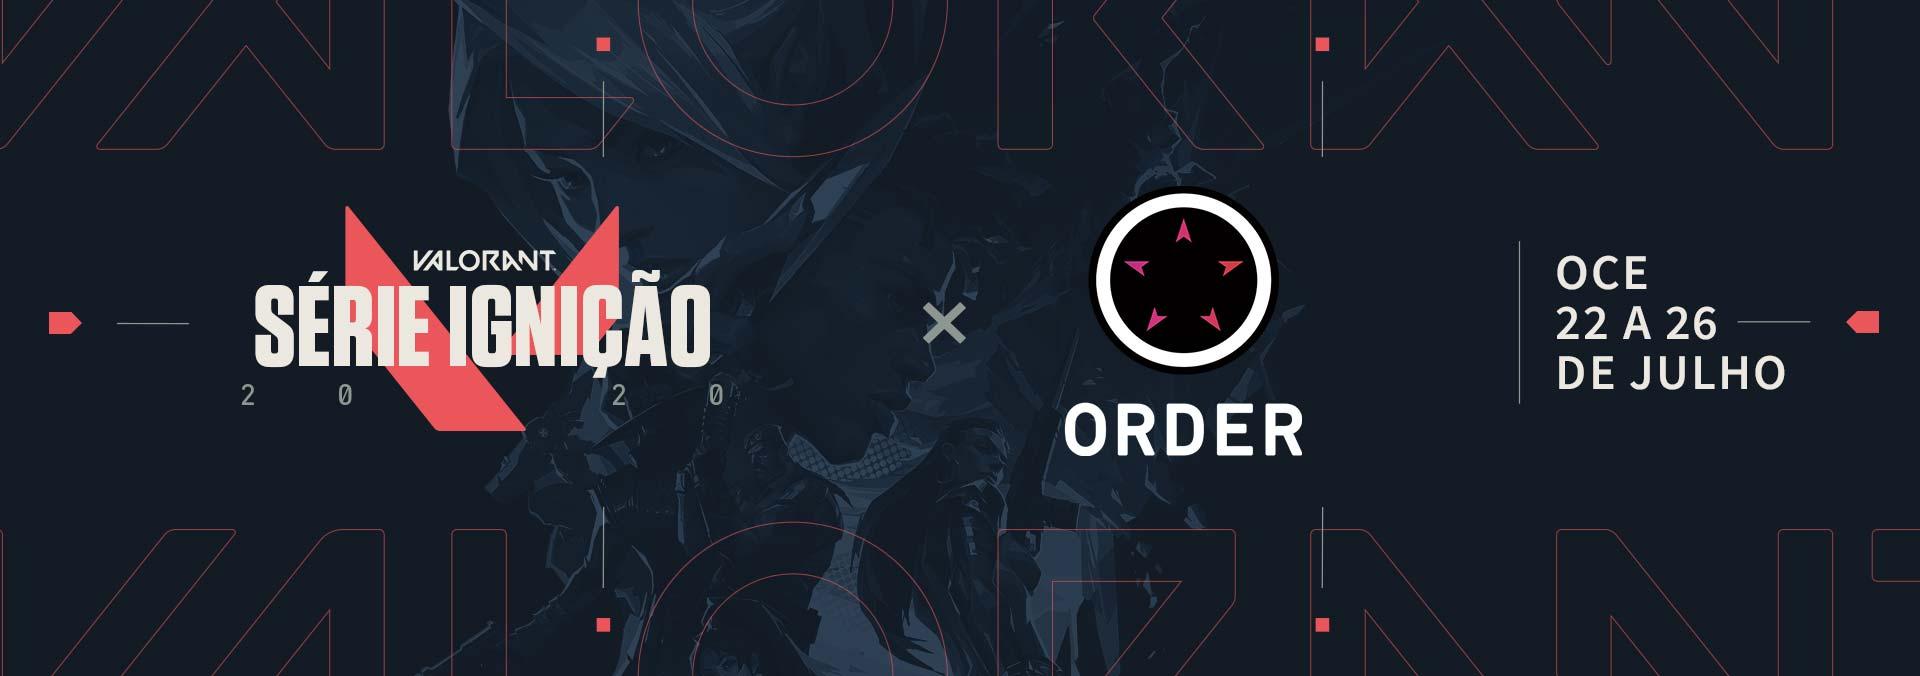 4_Order_OCE_BR.jpg